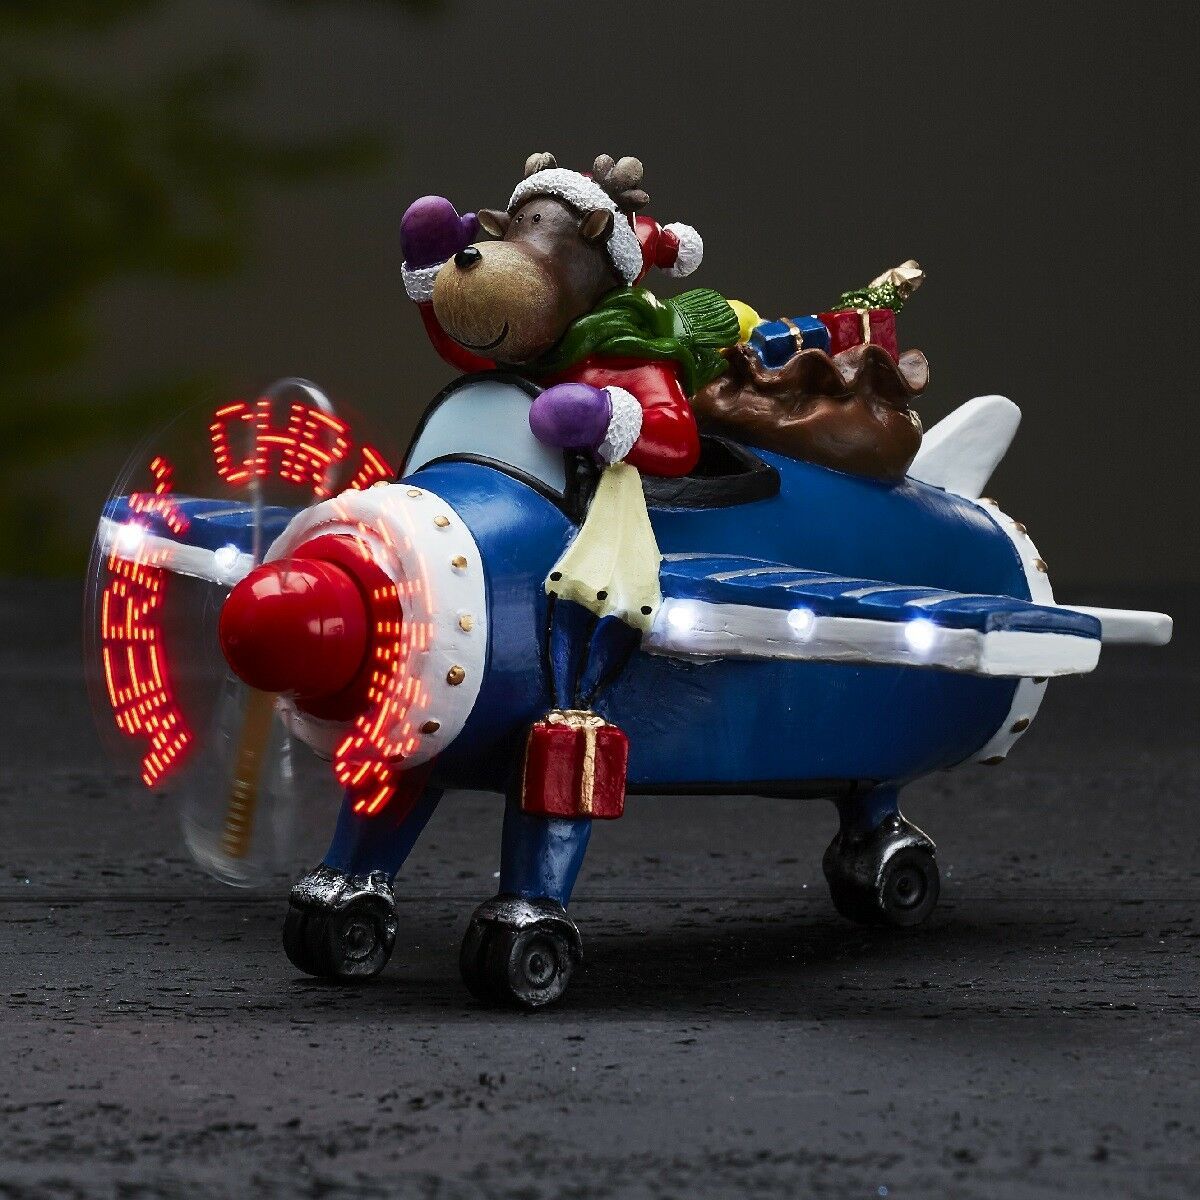 Led Batteria Batteria Batteria Motion Illuminazione Decorativa Statuina di Natale Kidsville Renna 63bbff